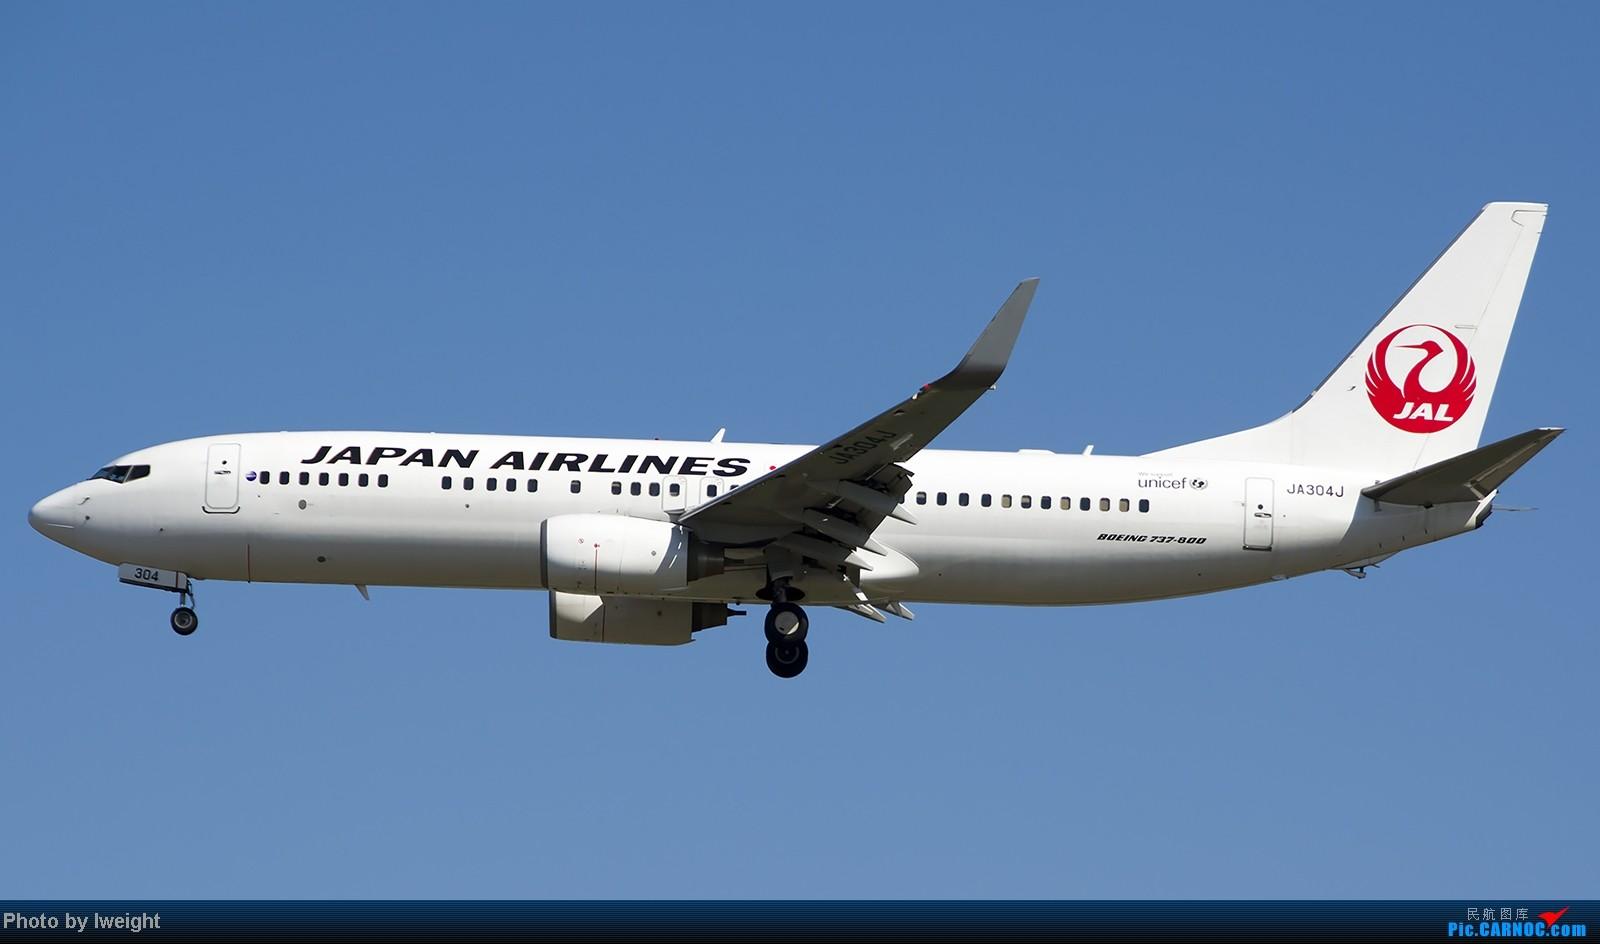 Re:[原创]难得赶上PEK周末好天气,各种常见机型都有收获 BOEING 737-800 JA304J 中国北京首都机场